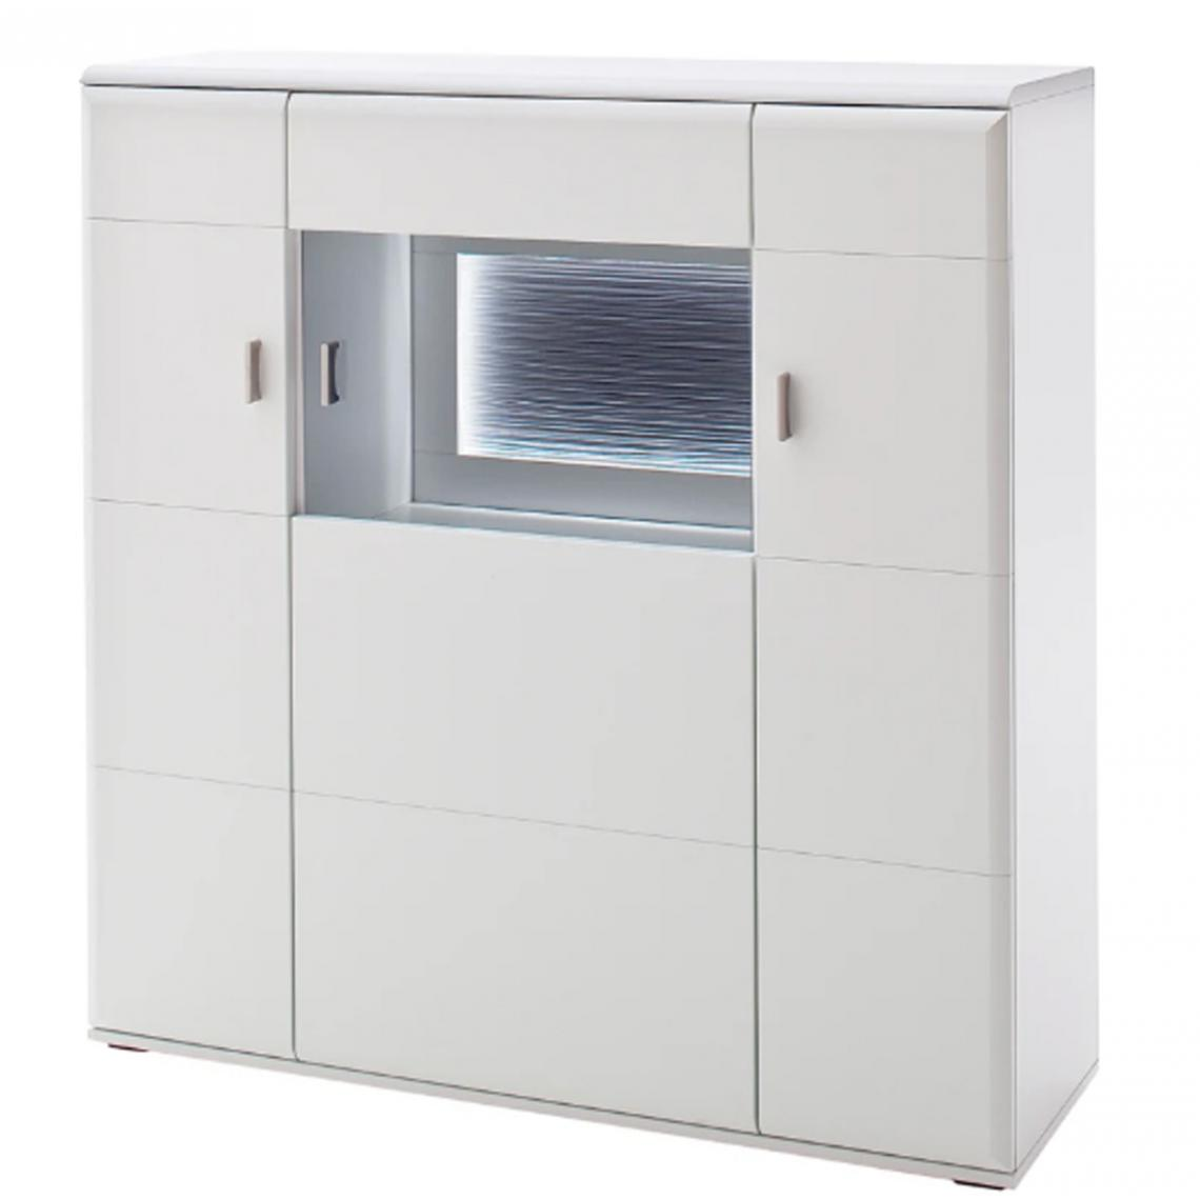 Pegane Buffet en bois coloris blanc mat - L.120 x H.124 x P.38 cm